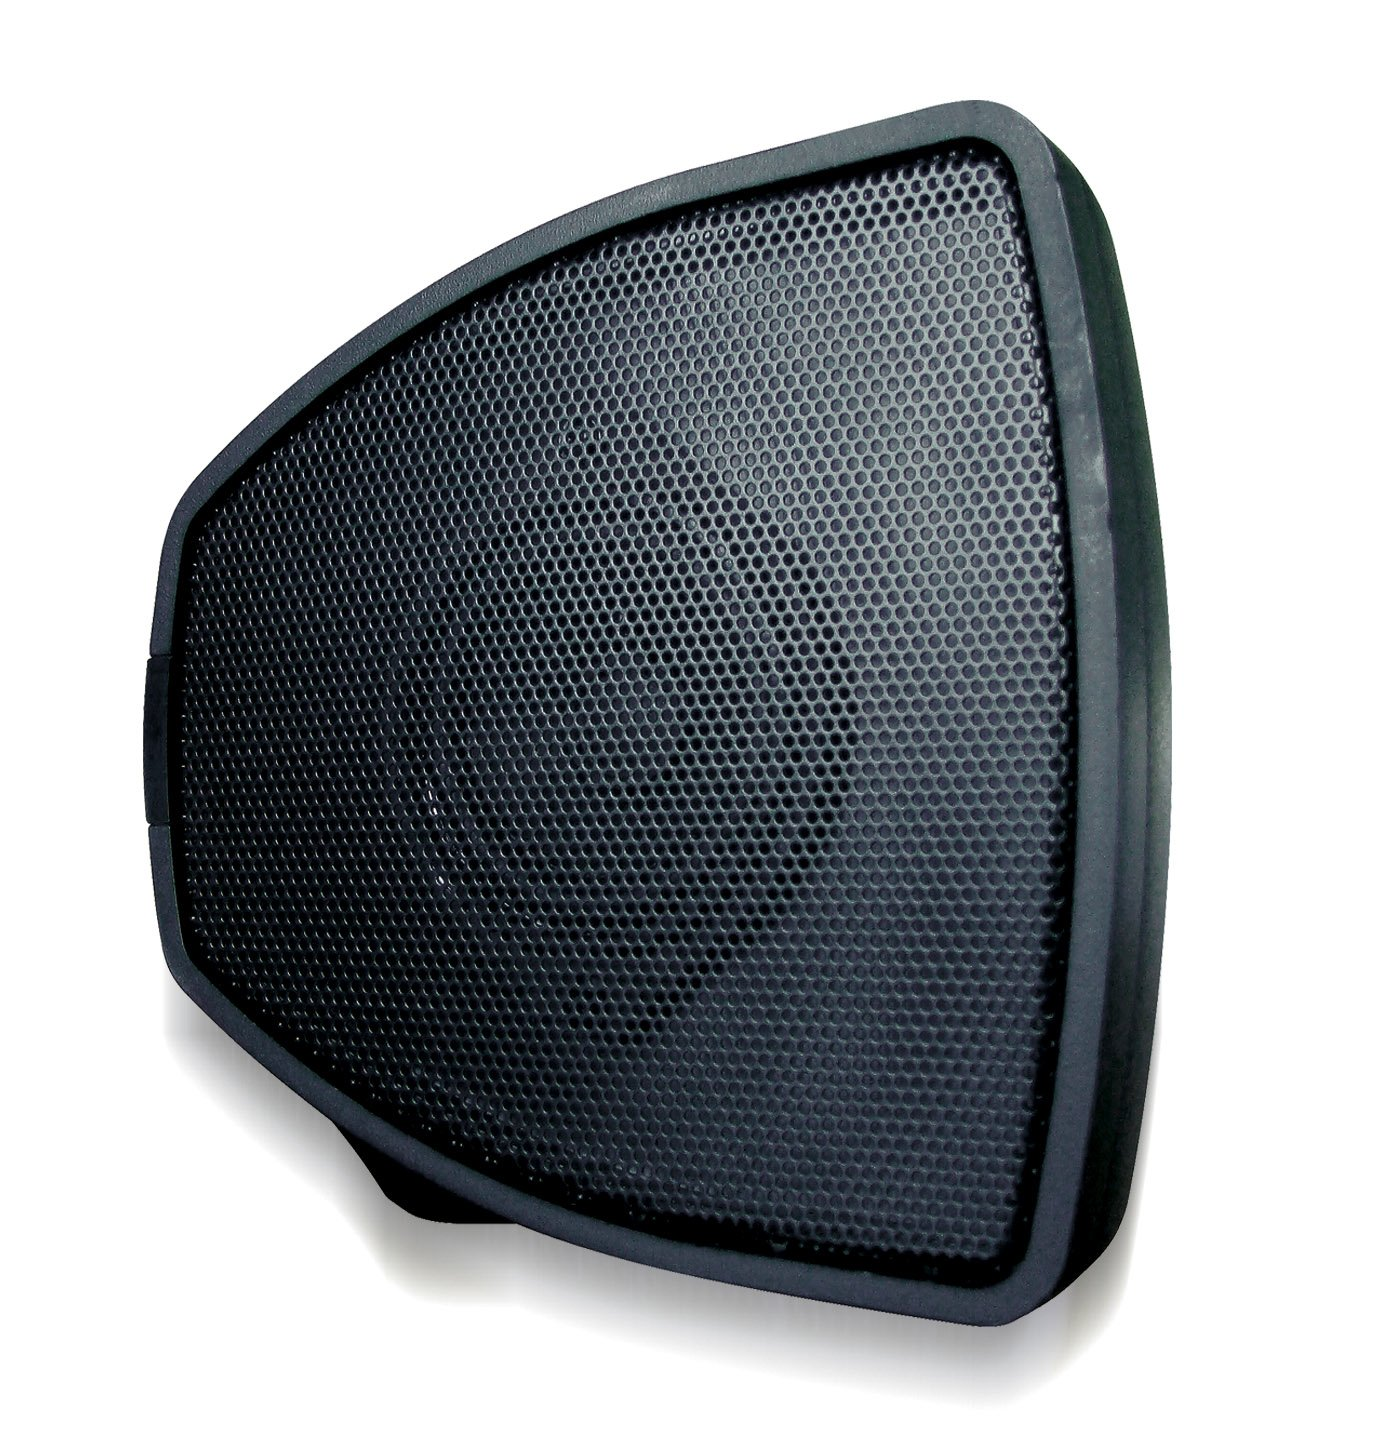 Soundbar COBRA mod. MASCAGNI, ingresso audio Line-in per ...